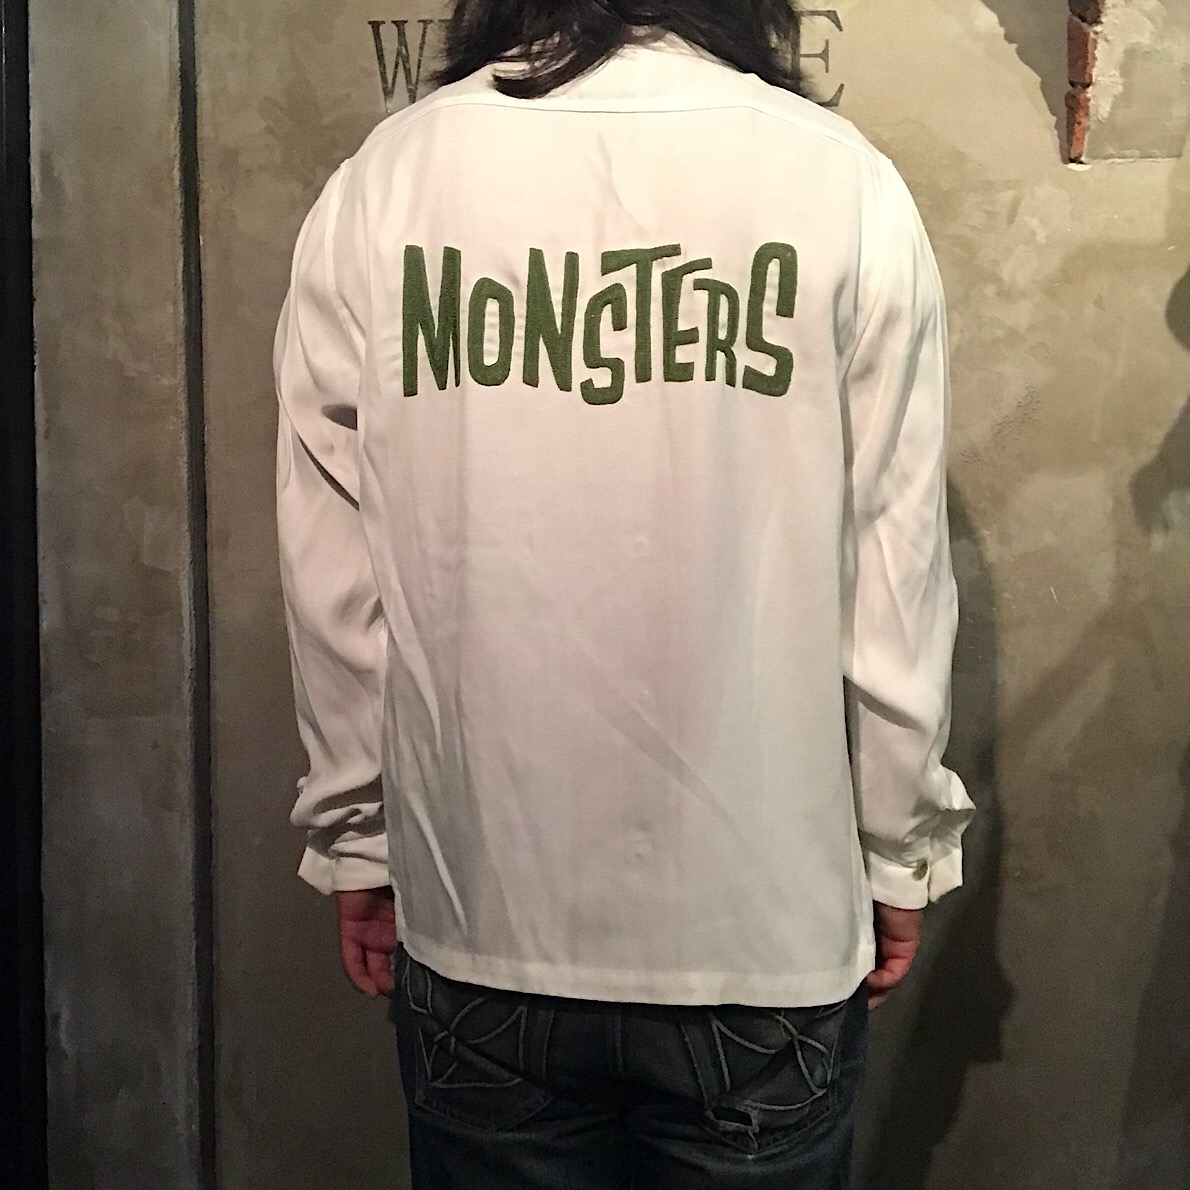 WEIRDO MONSTERS - L/S SHIRTS (WHITE)